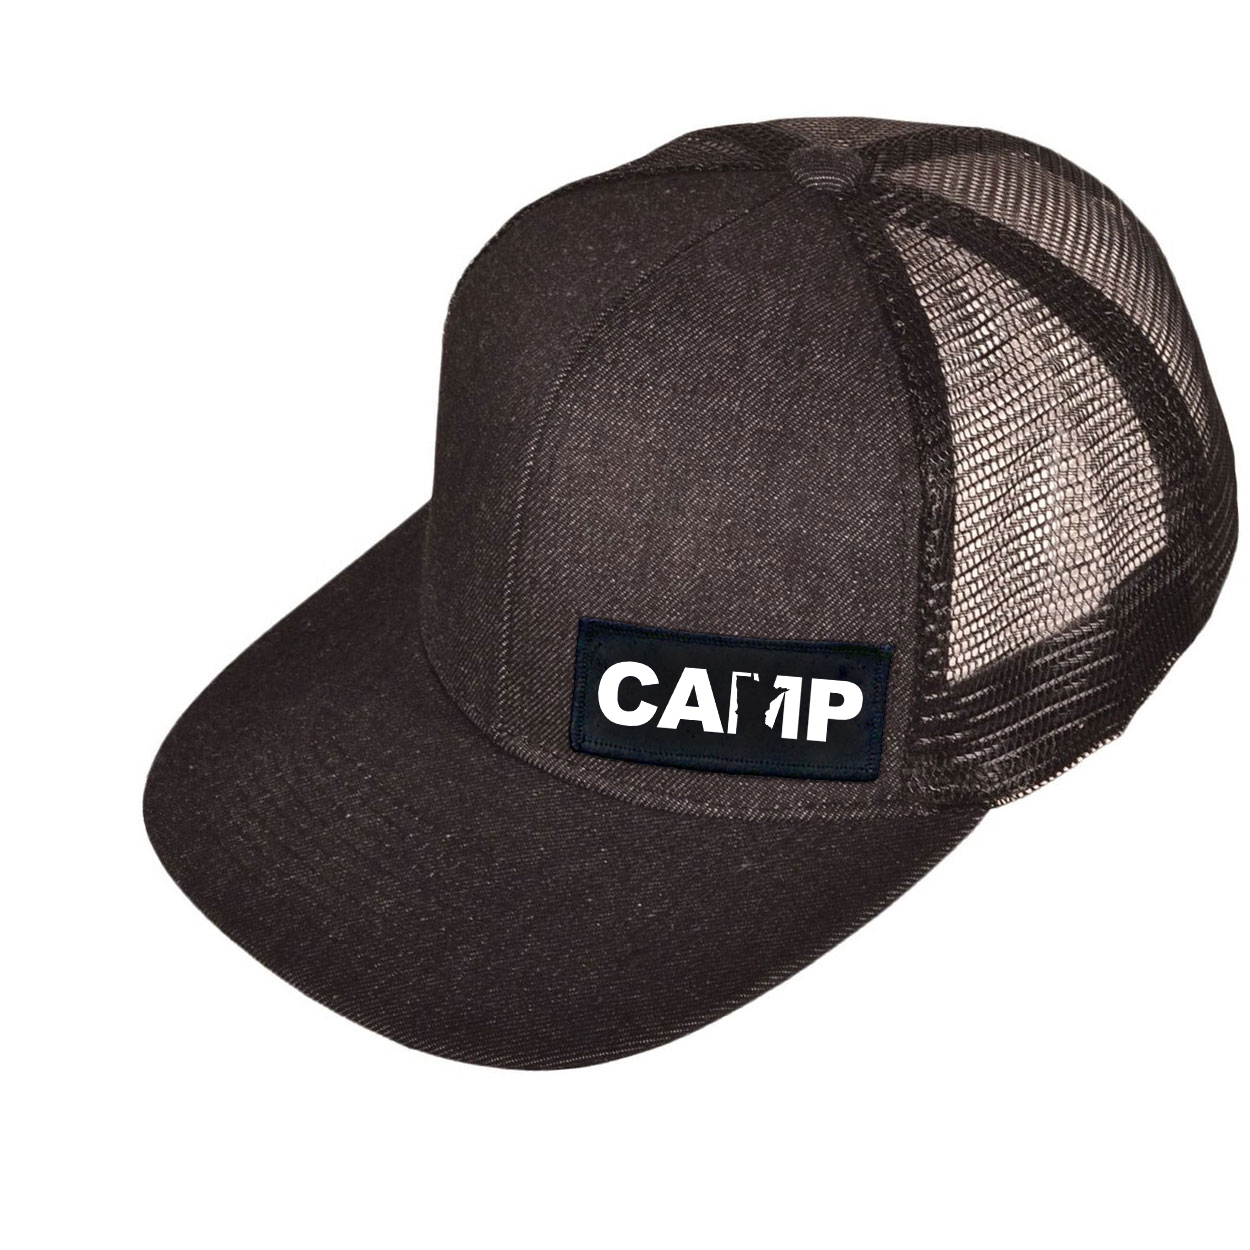 Camp Minnesota Night Out Woven Patch Snapback Flat Brim Hat Black Denim (White Logo)